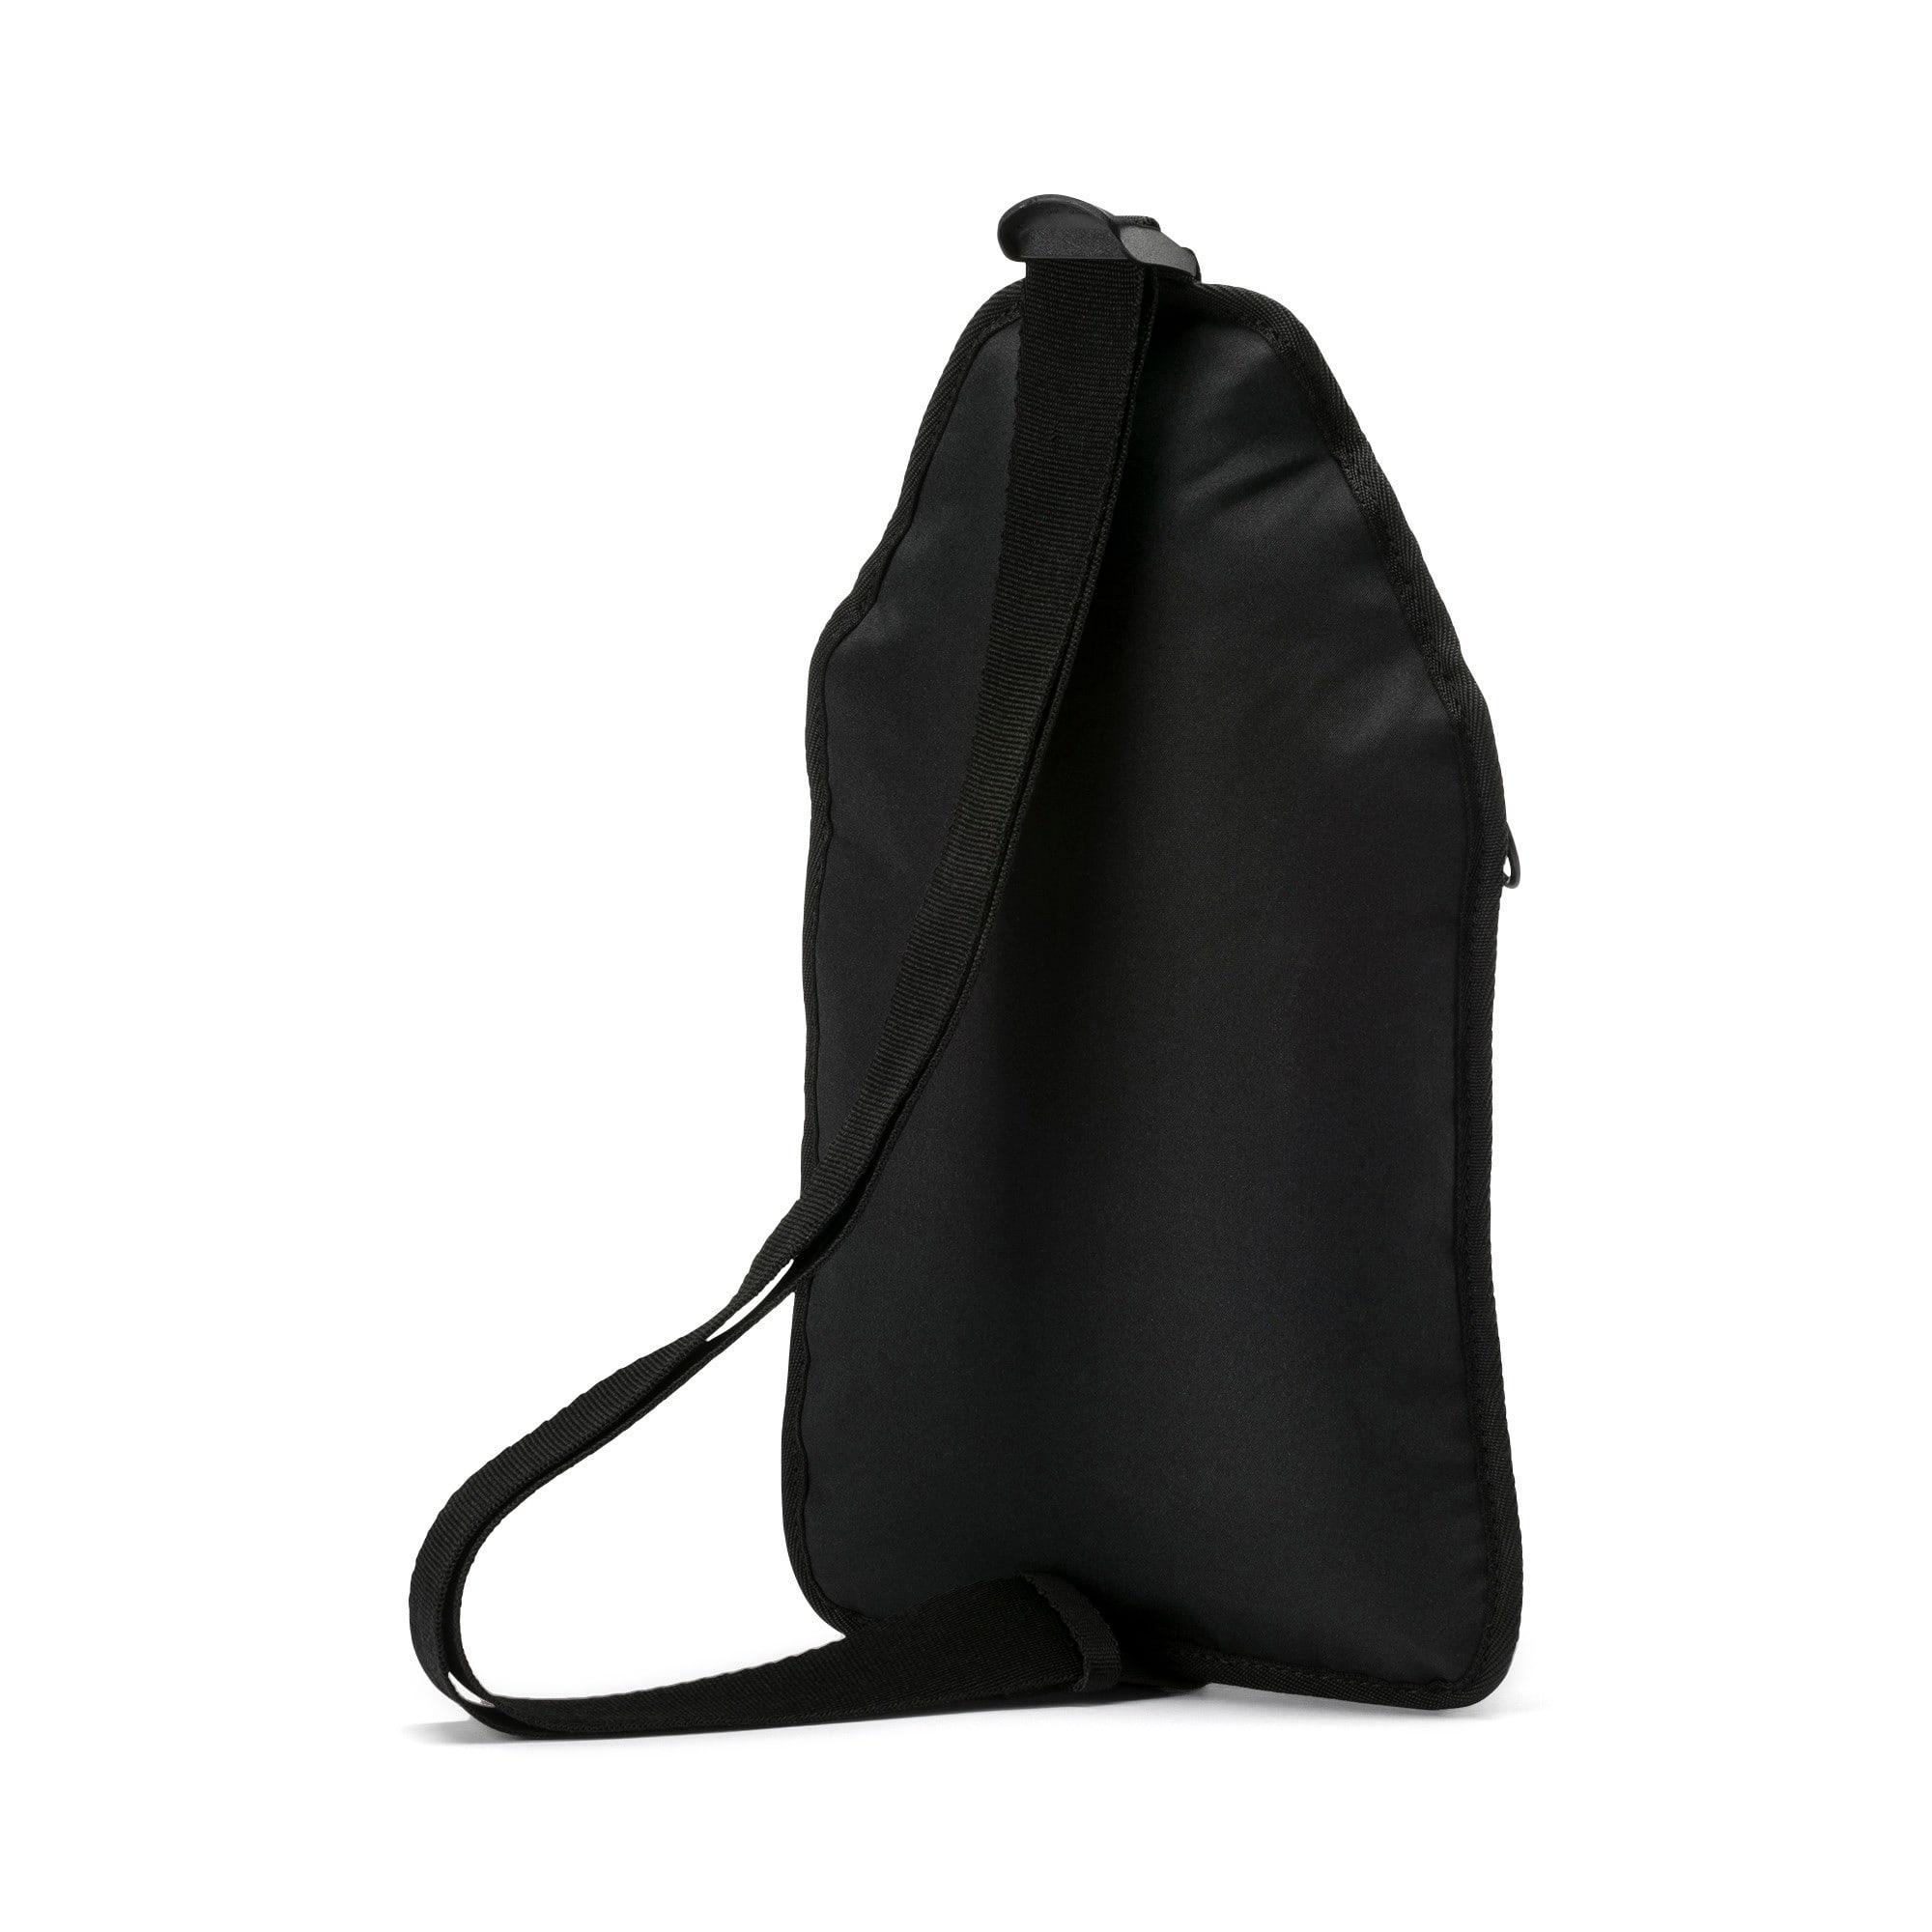 Thumbnail 3 of Prime Street Women's Sling Bag, Puma Black, medium-SEA